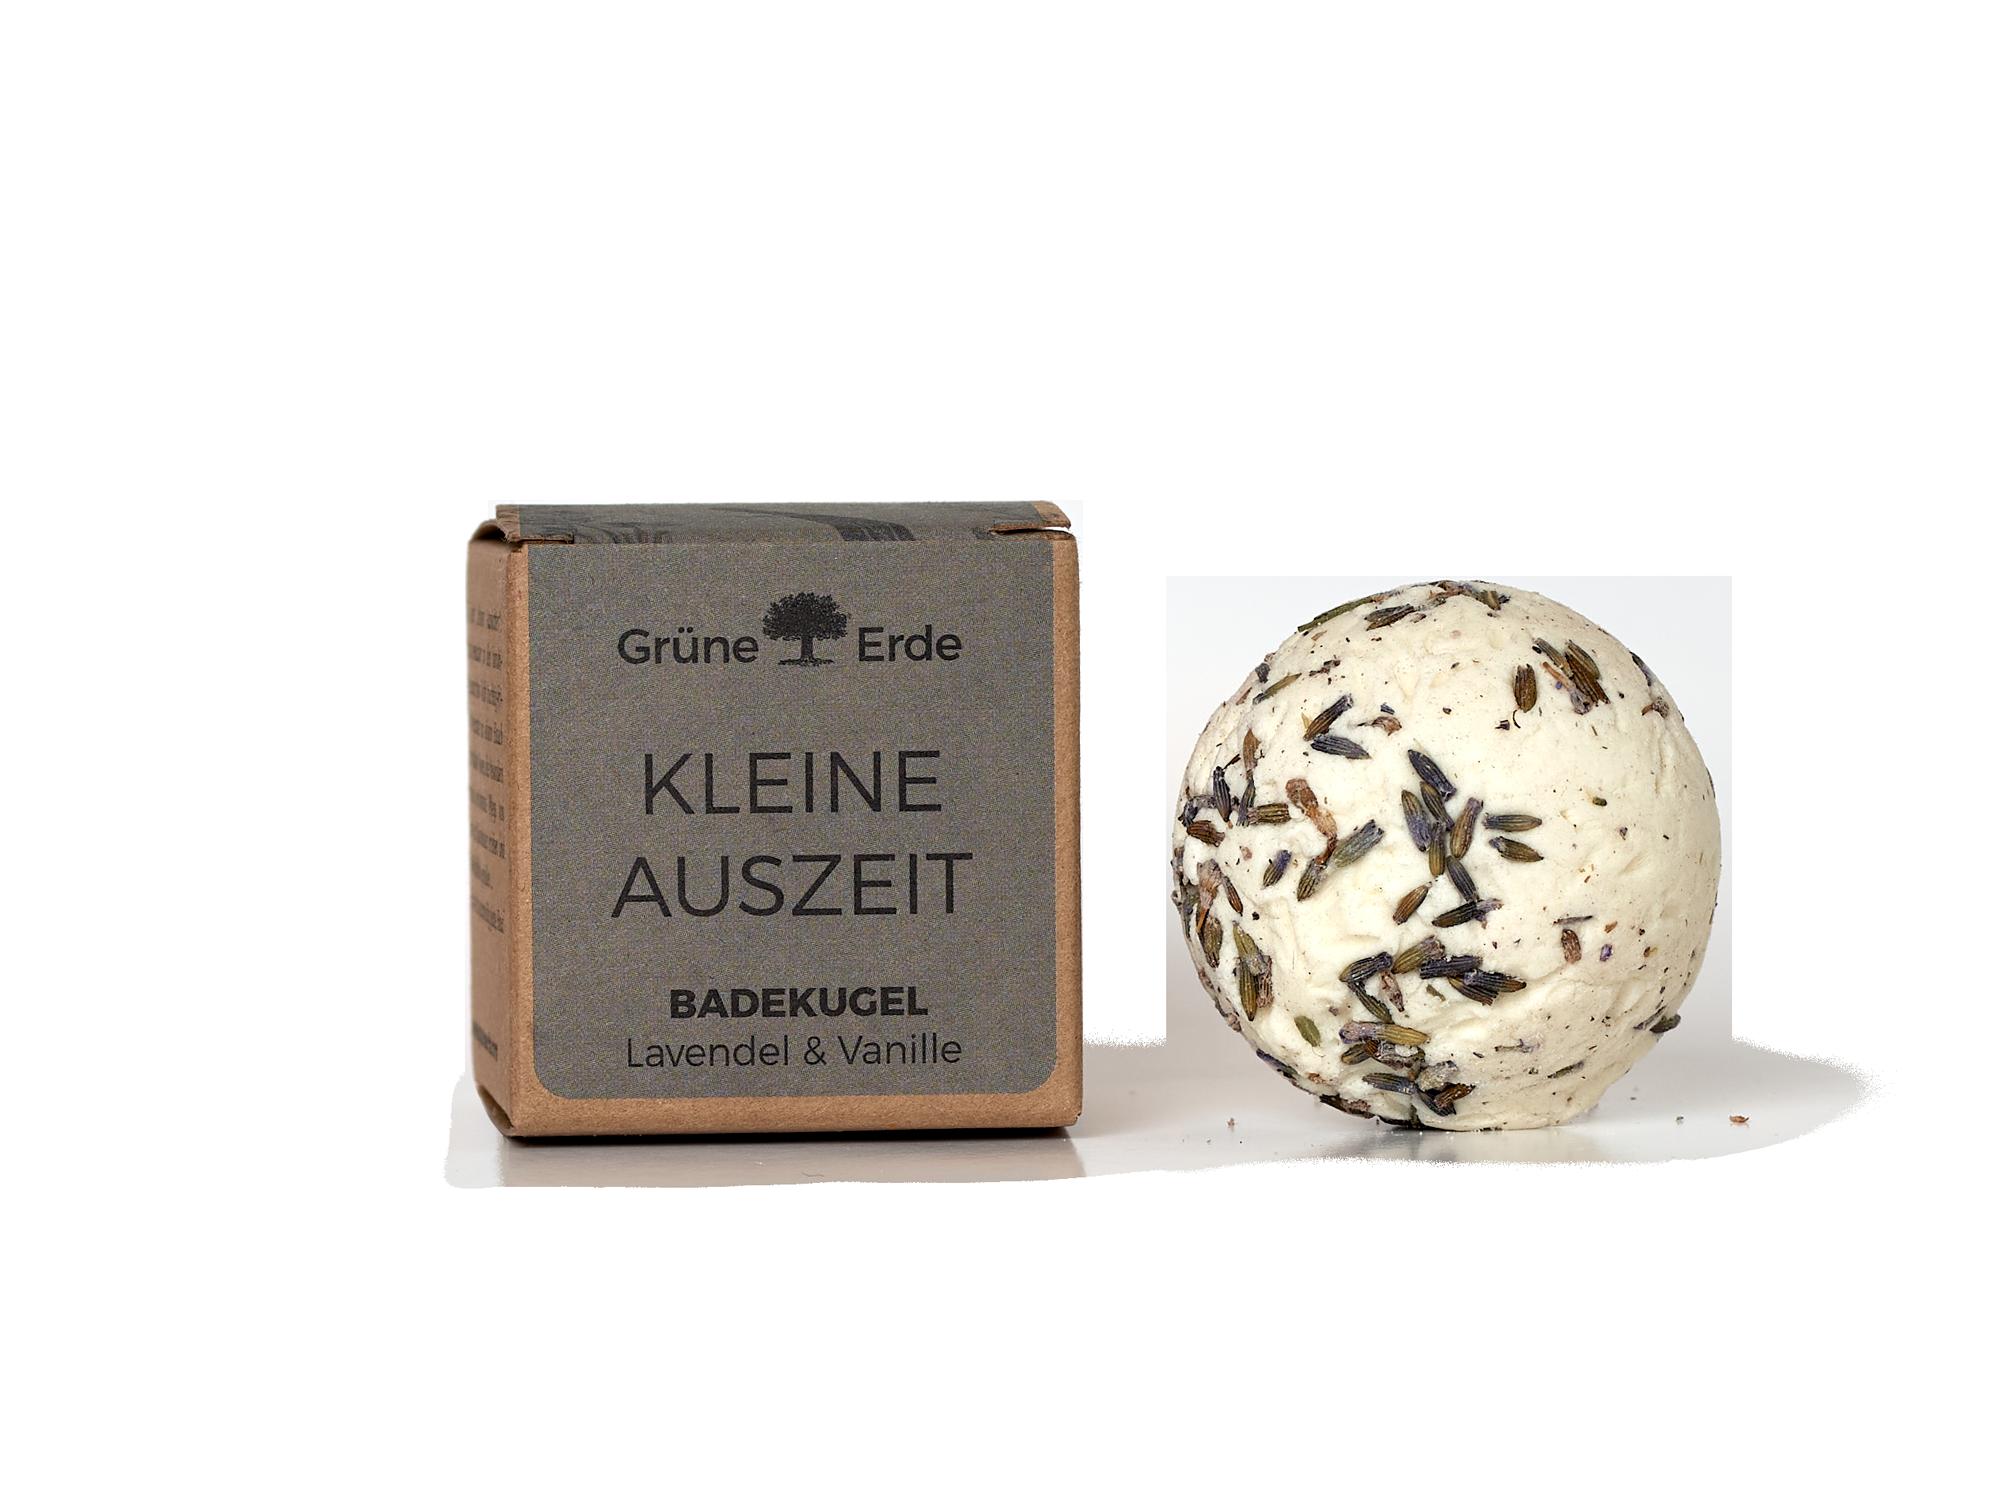 kleine auszeit badekugel lavendel vanille 50 g gr ne erde. Black Bedroom Furniture Sets. Home Design Ideas